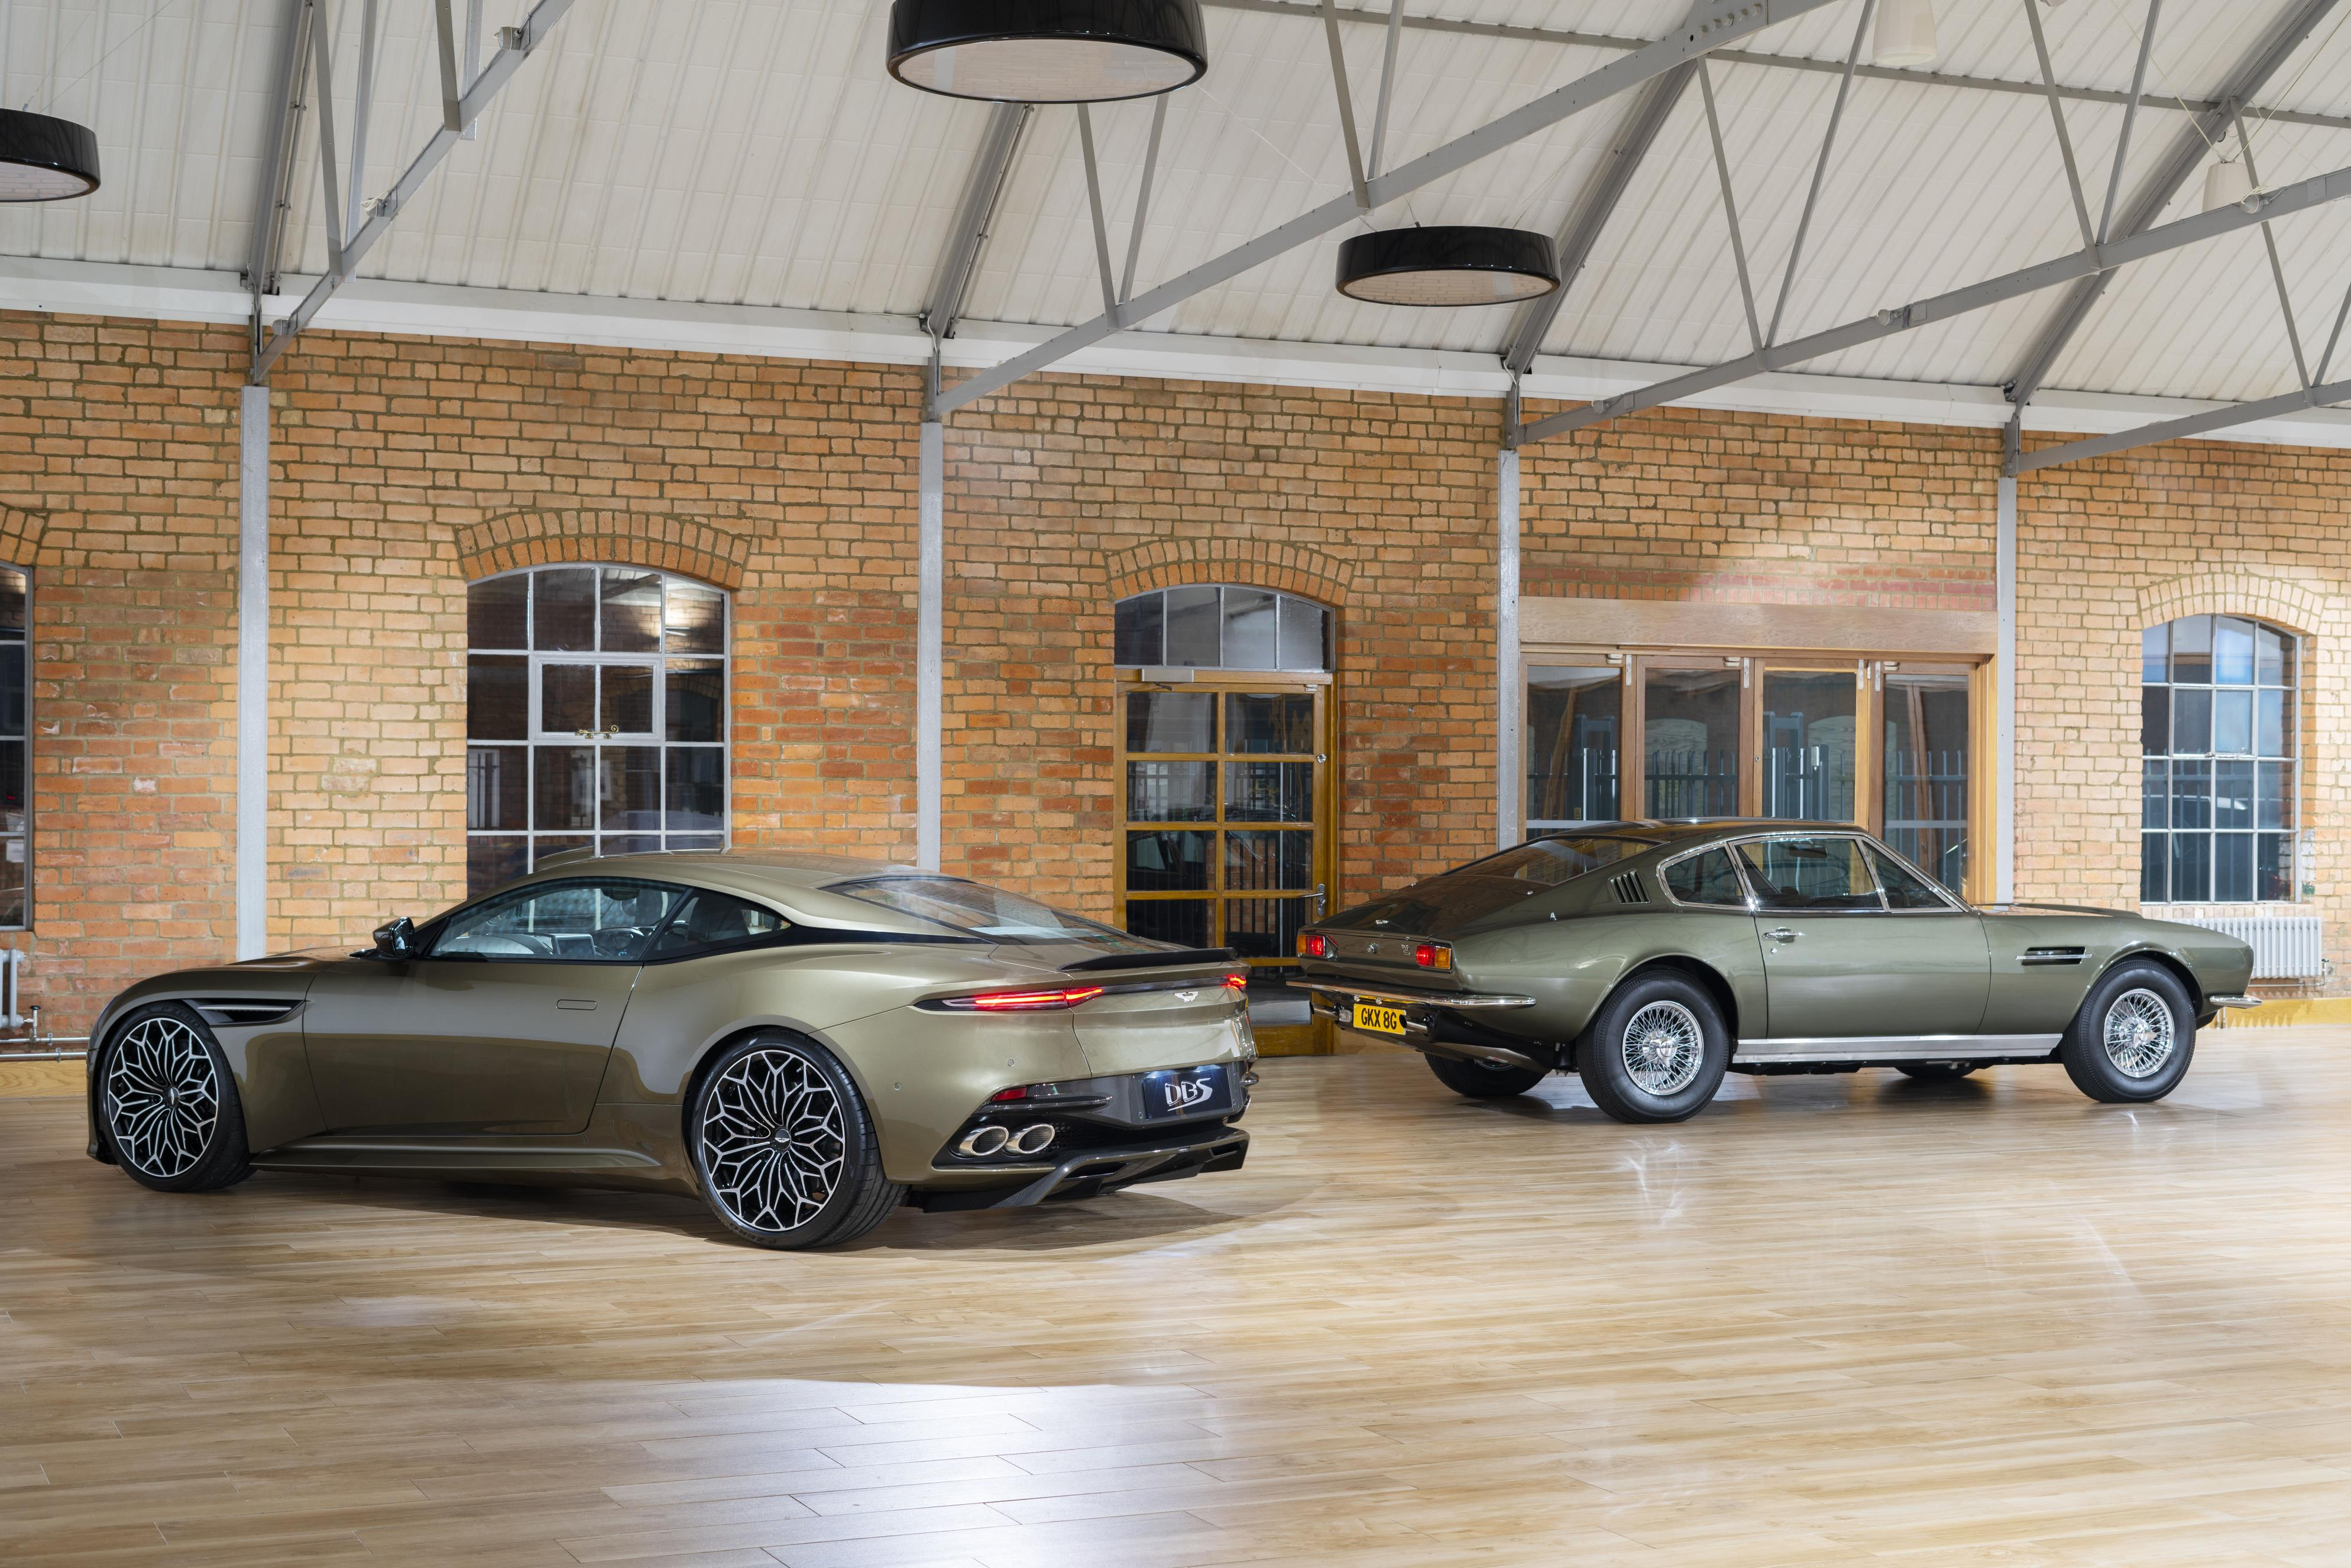 James Bond Aston Martin DBS Superleggera